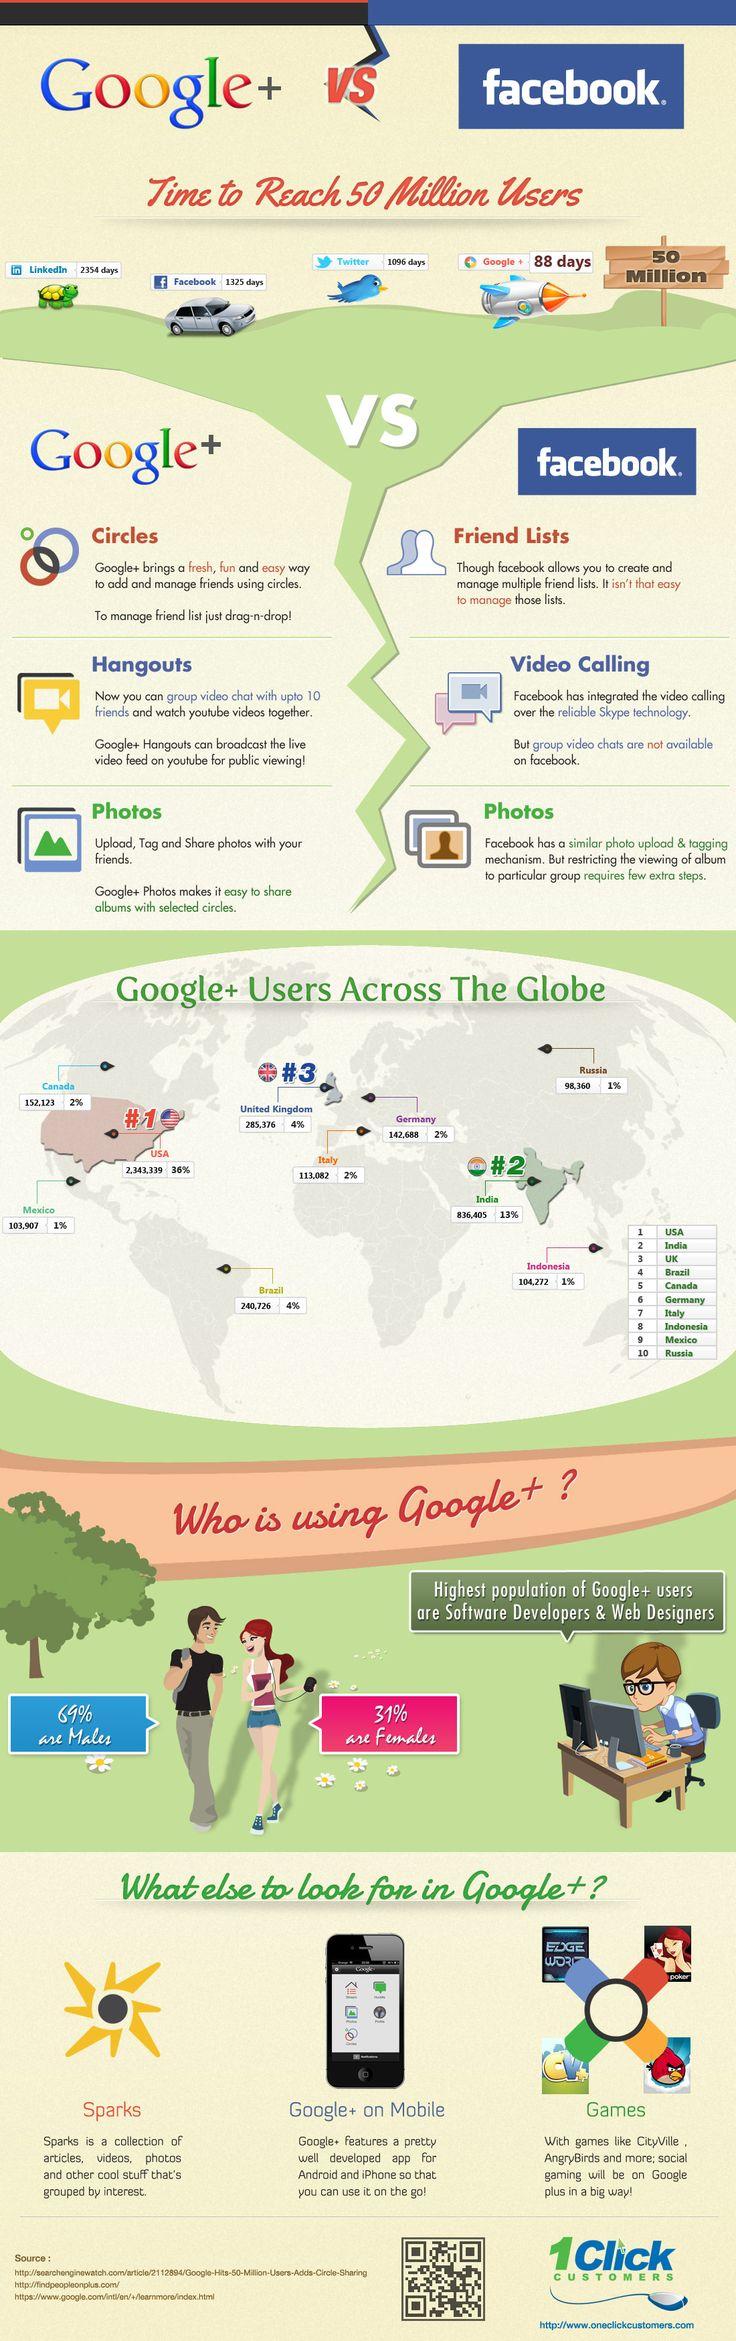 #GooglePlus vs #Facebook